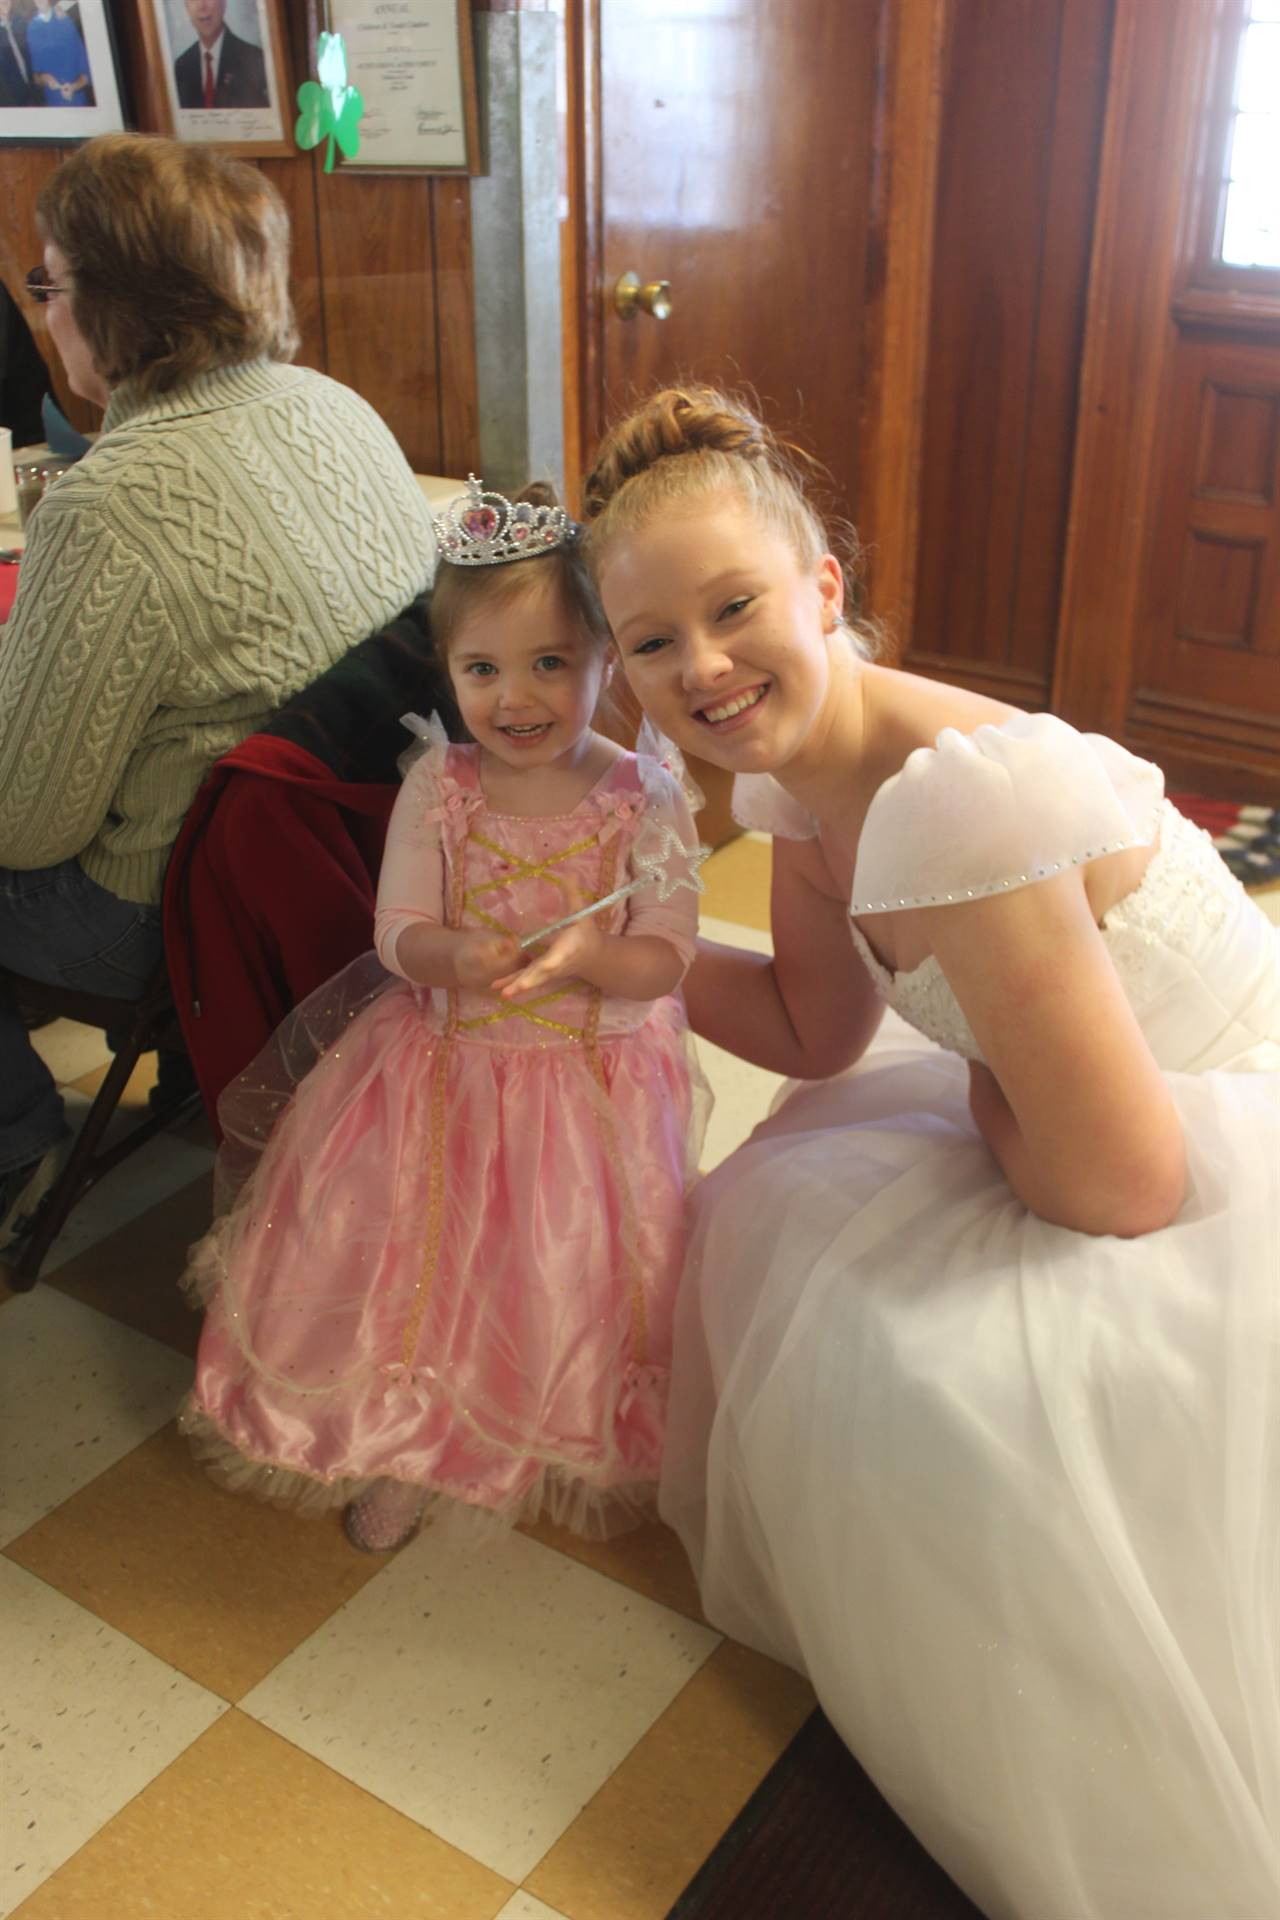 Cinderella with a young princess